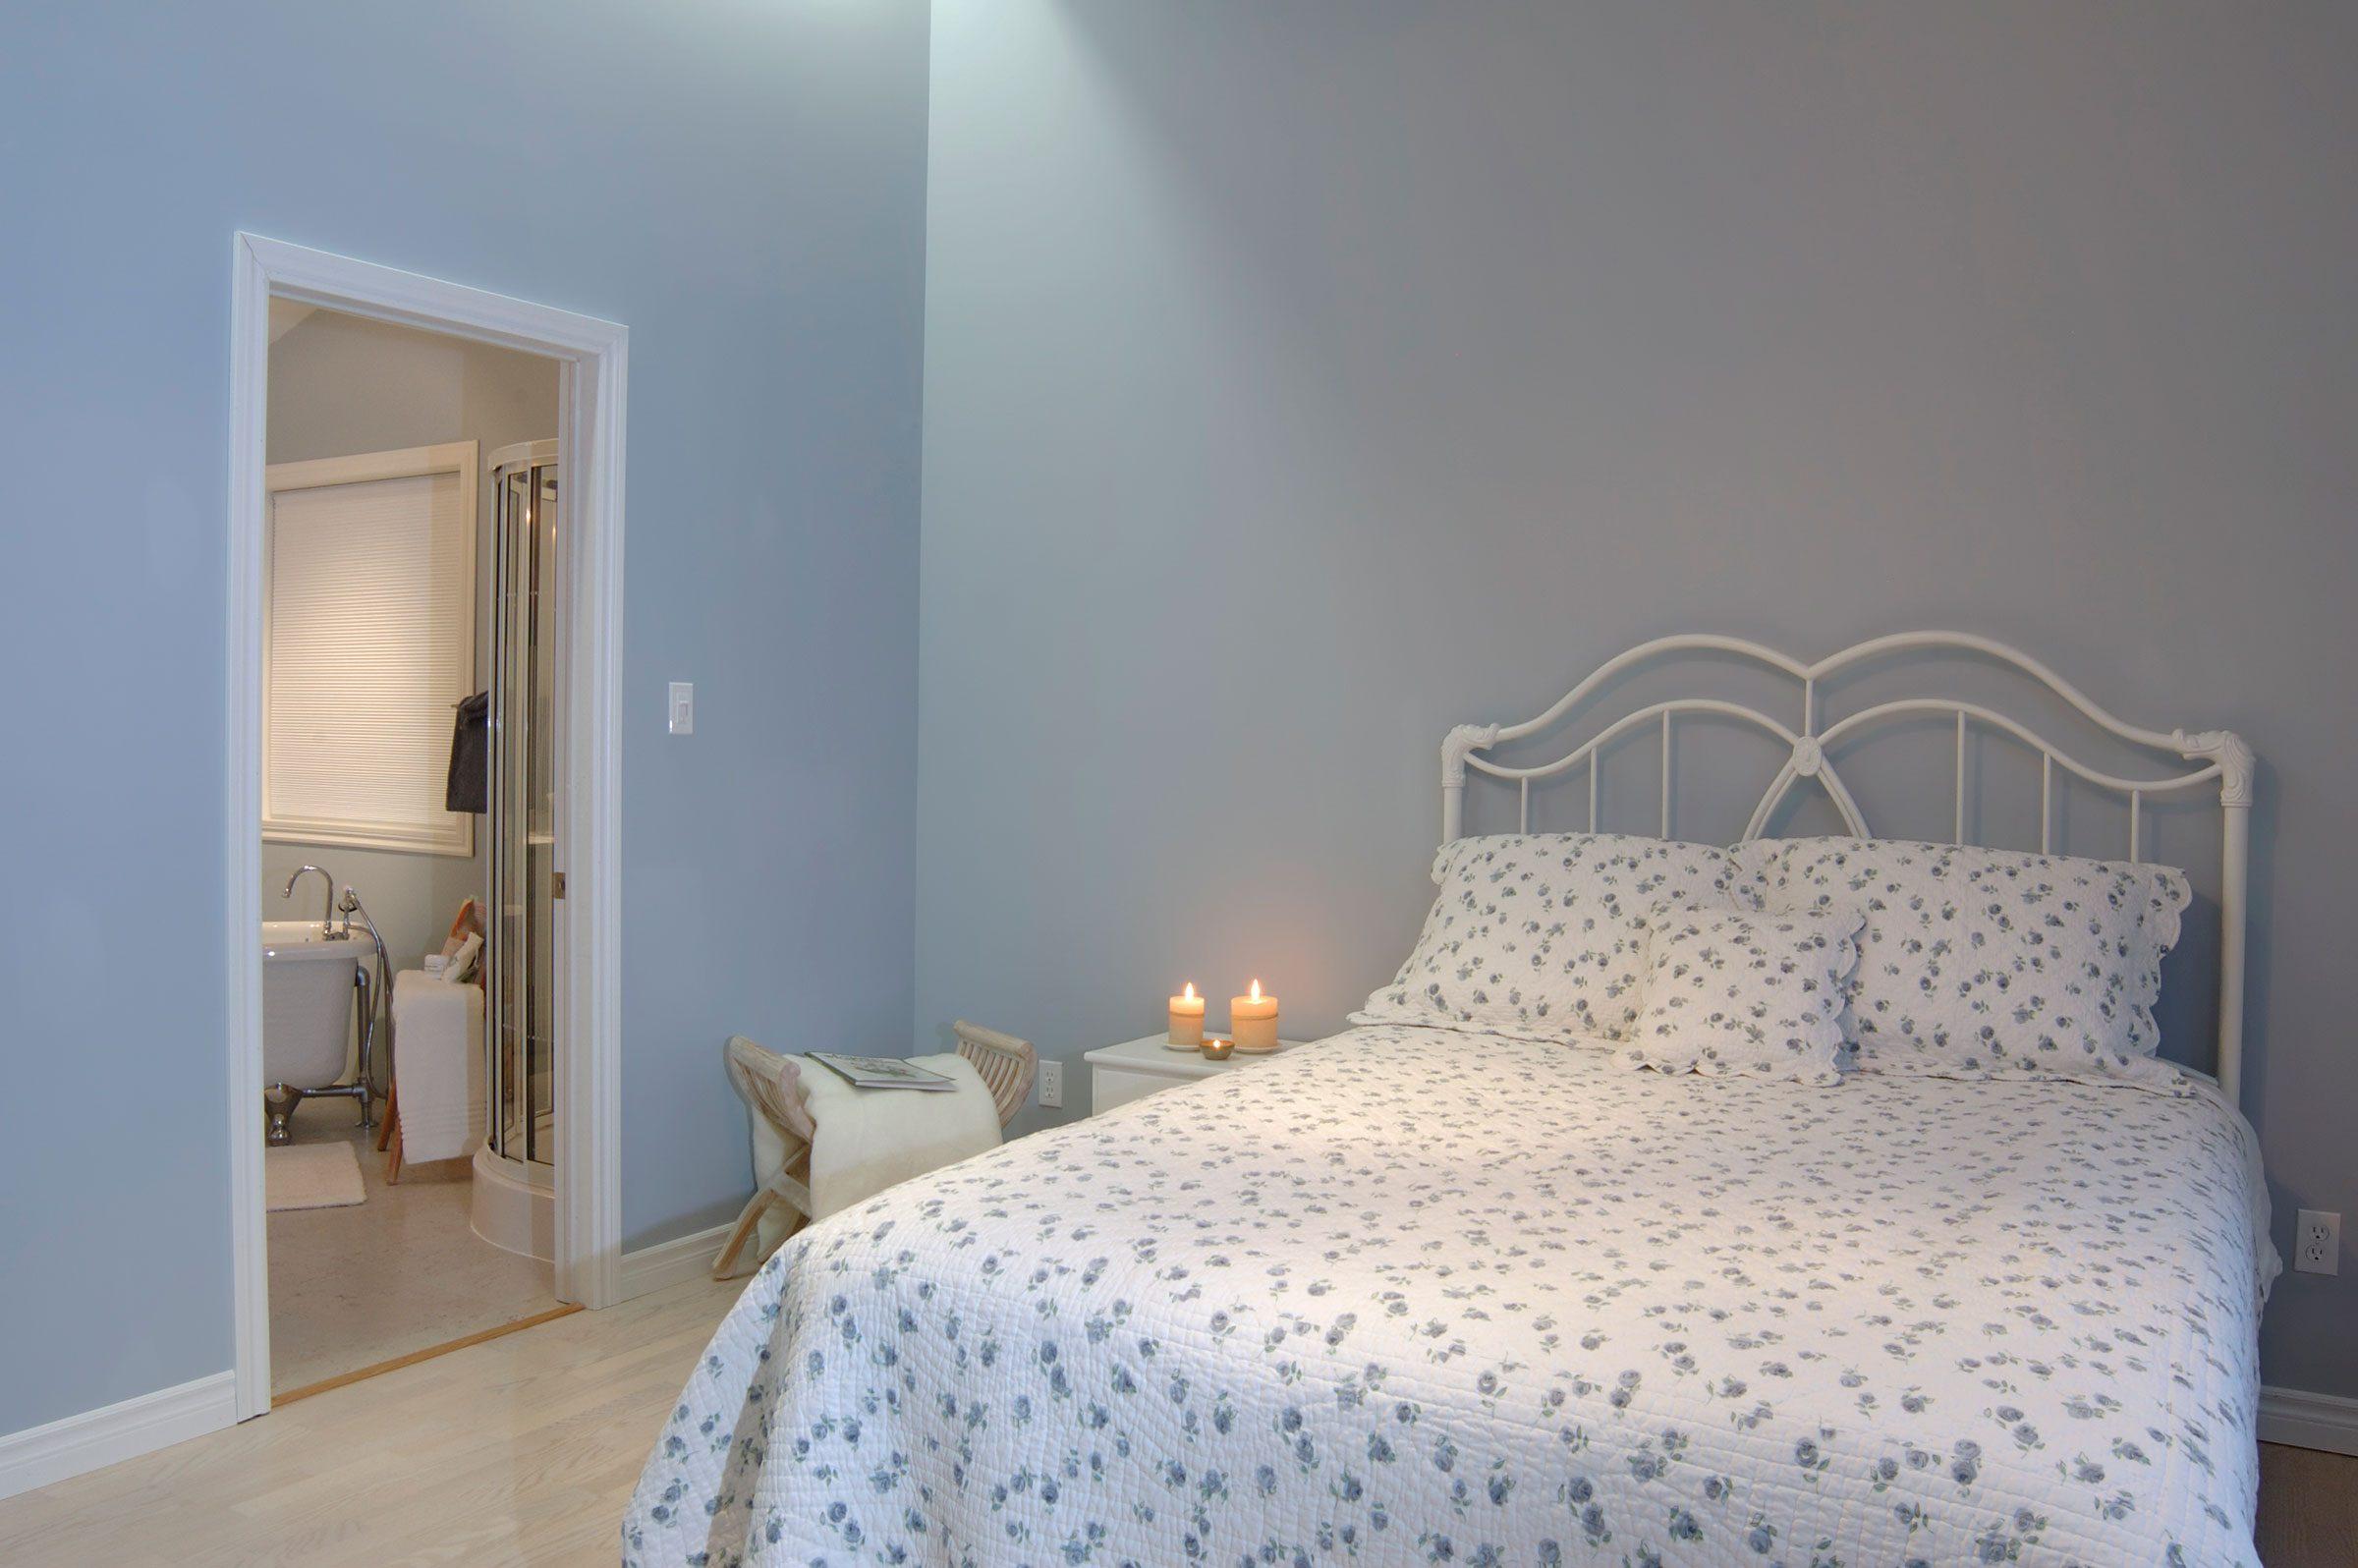 Sleep Hygiene Tips Bedroom Changes For Better Sleep